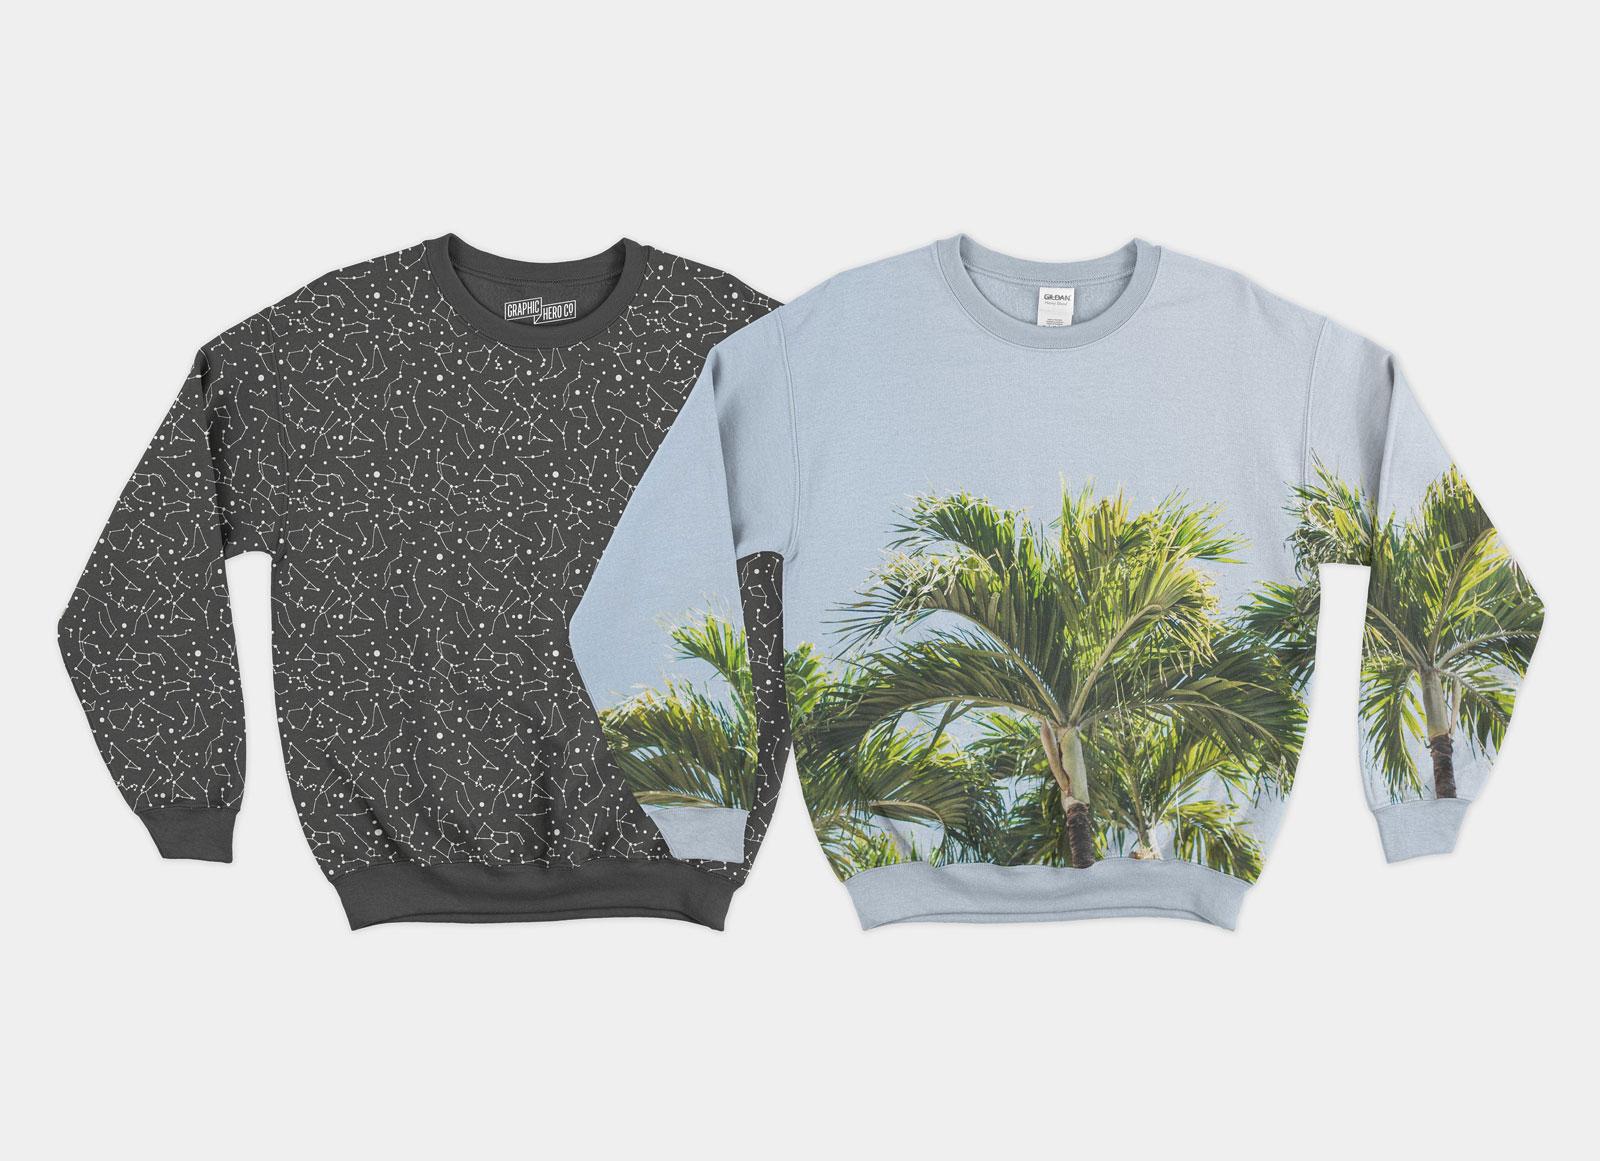 Free front back crewneck sweatshirt mockup psd good mockups free front back crewneck sweatshirt mockup psd maxwellsz